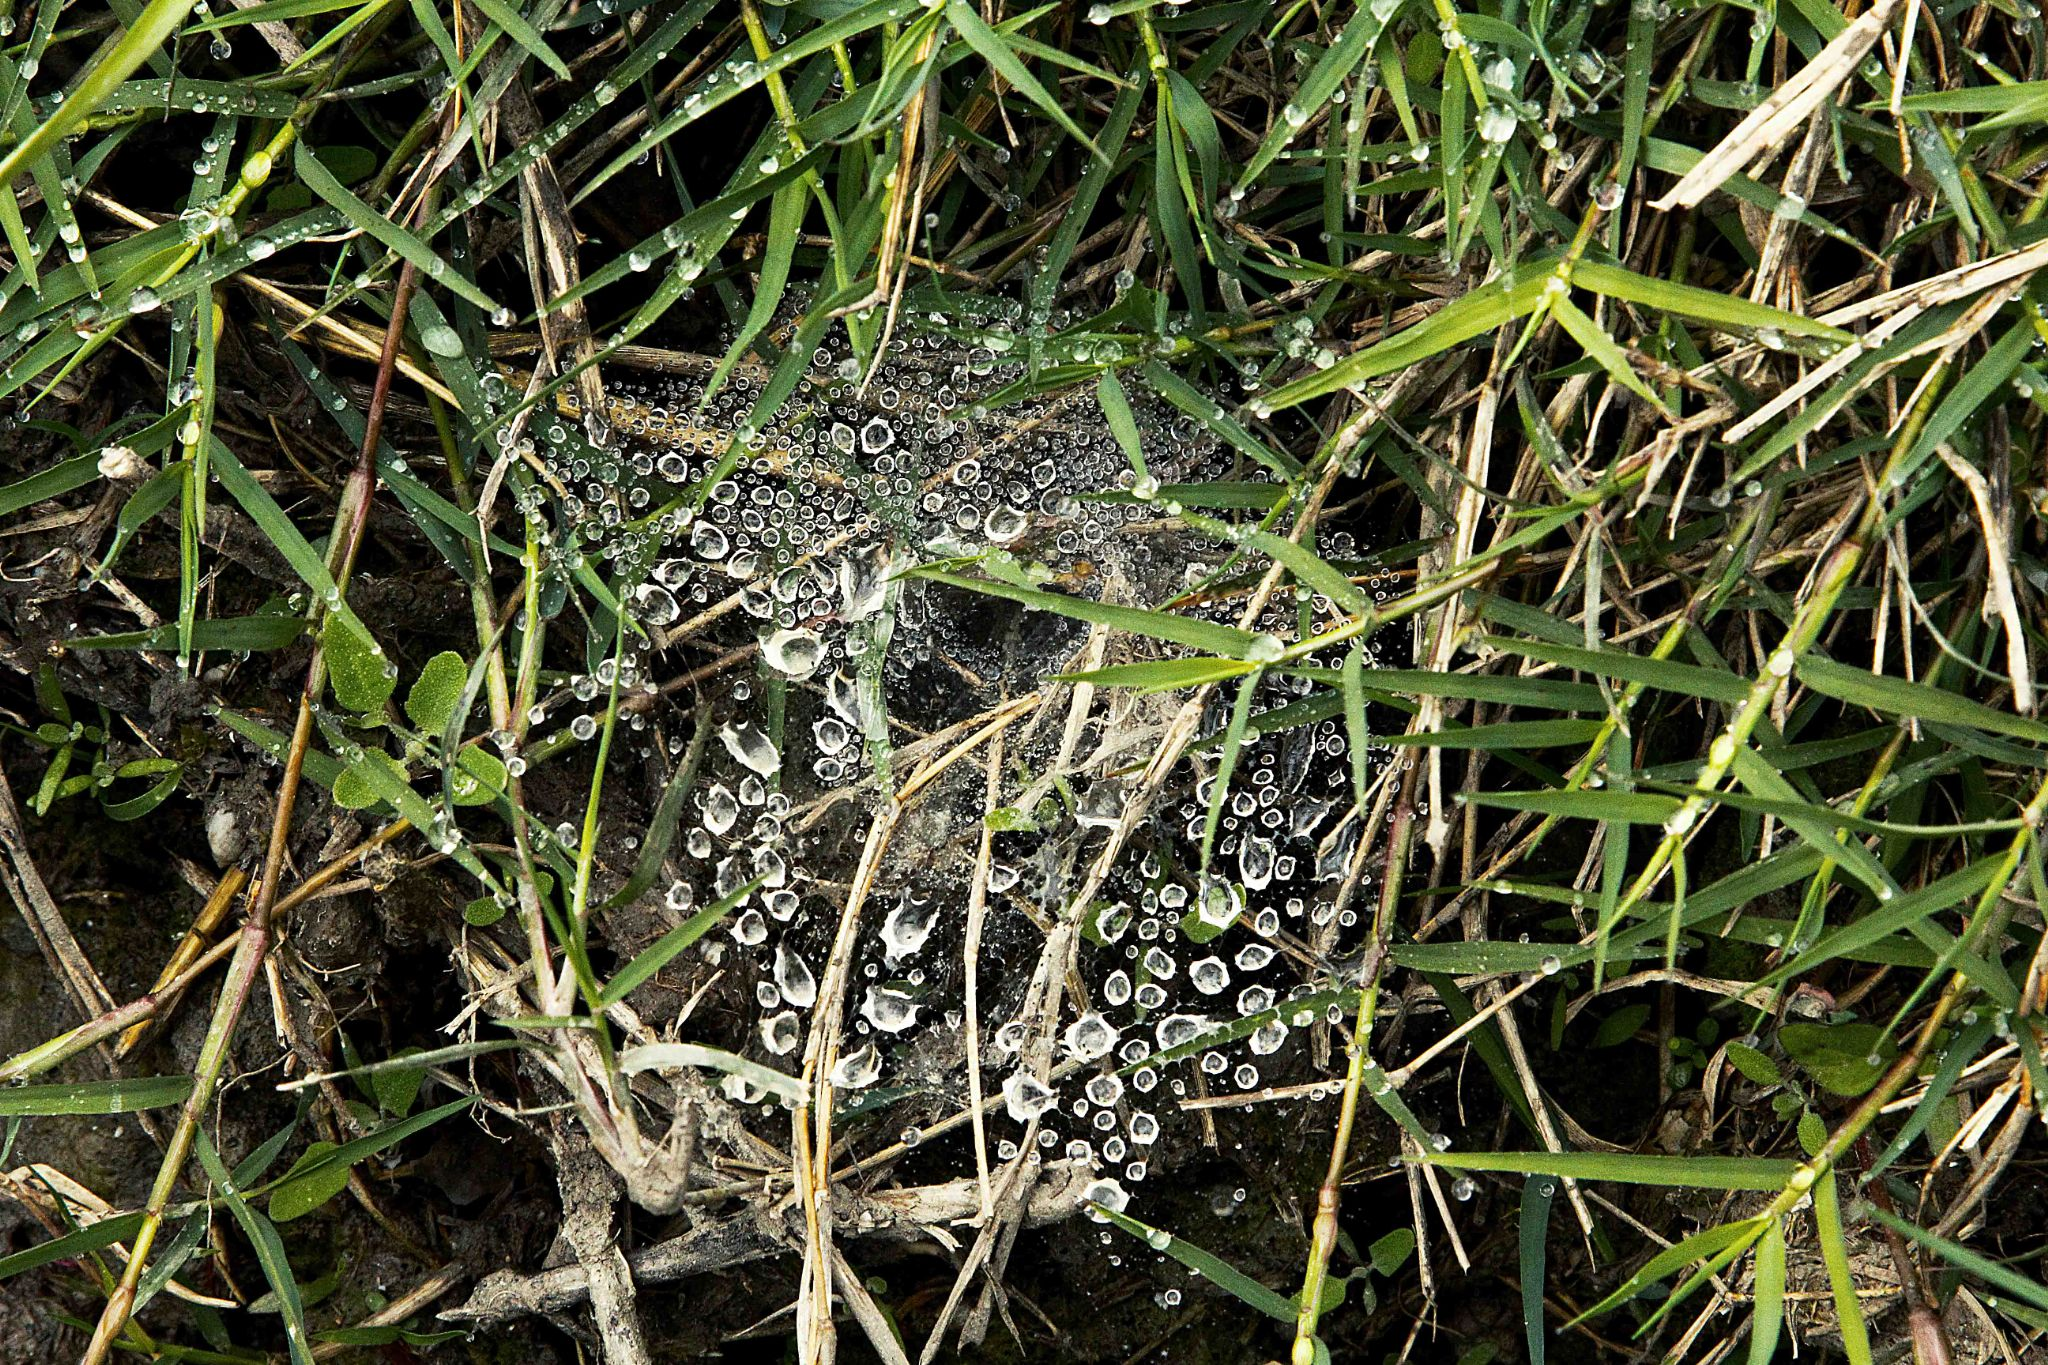 Cobweb with drops by mohammad mardan